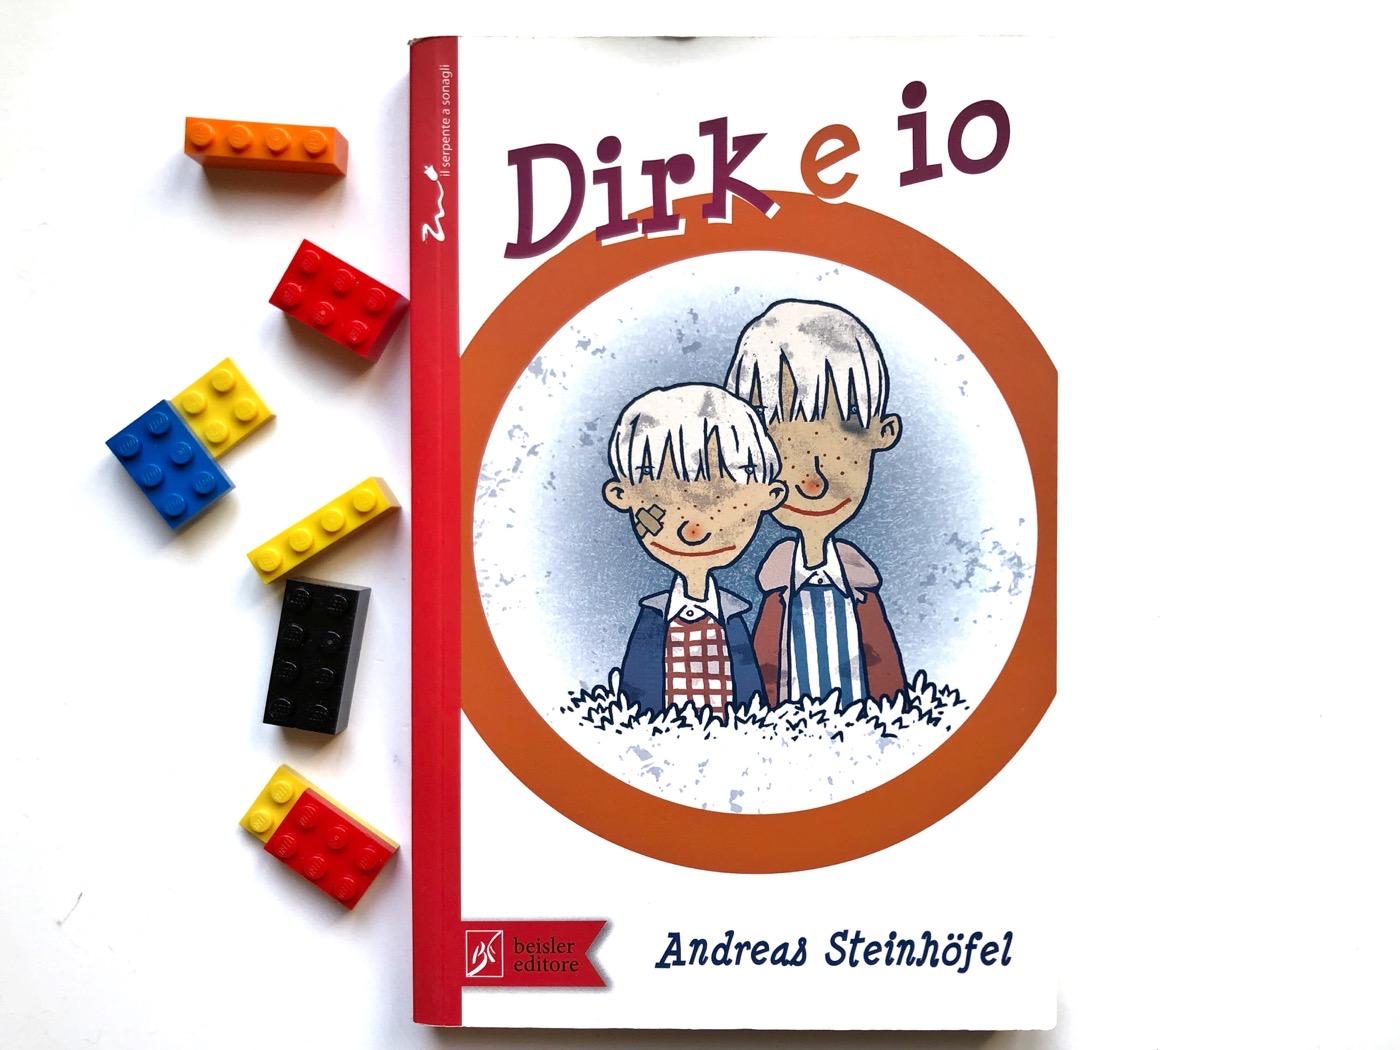 dirk-e-io-andreas-steinhoefel-beisler